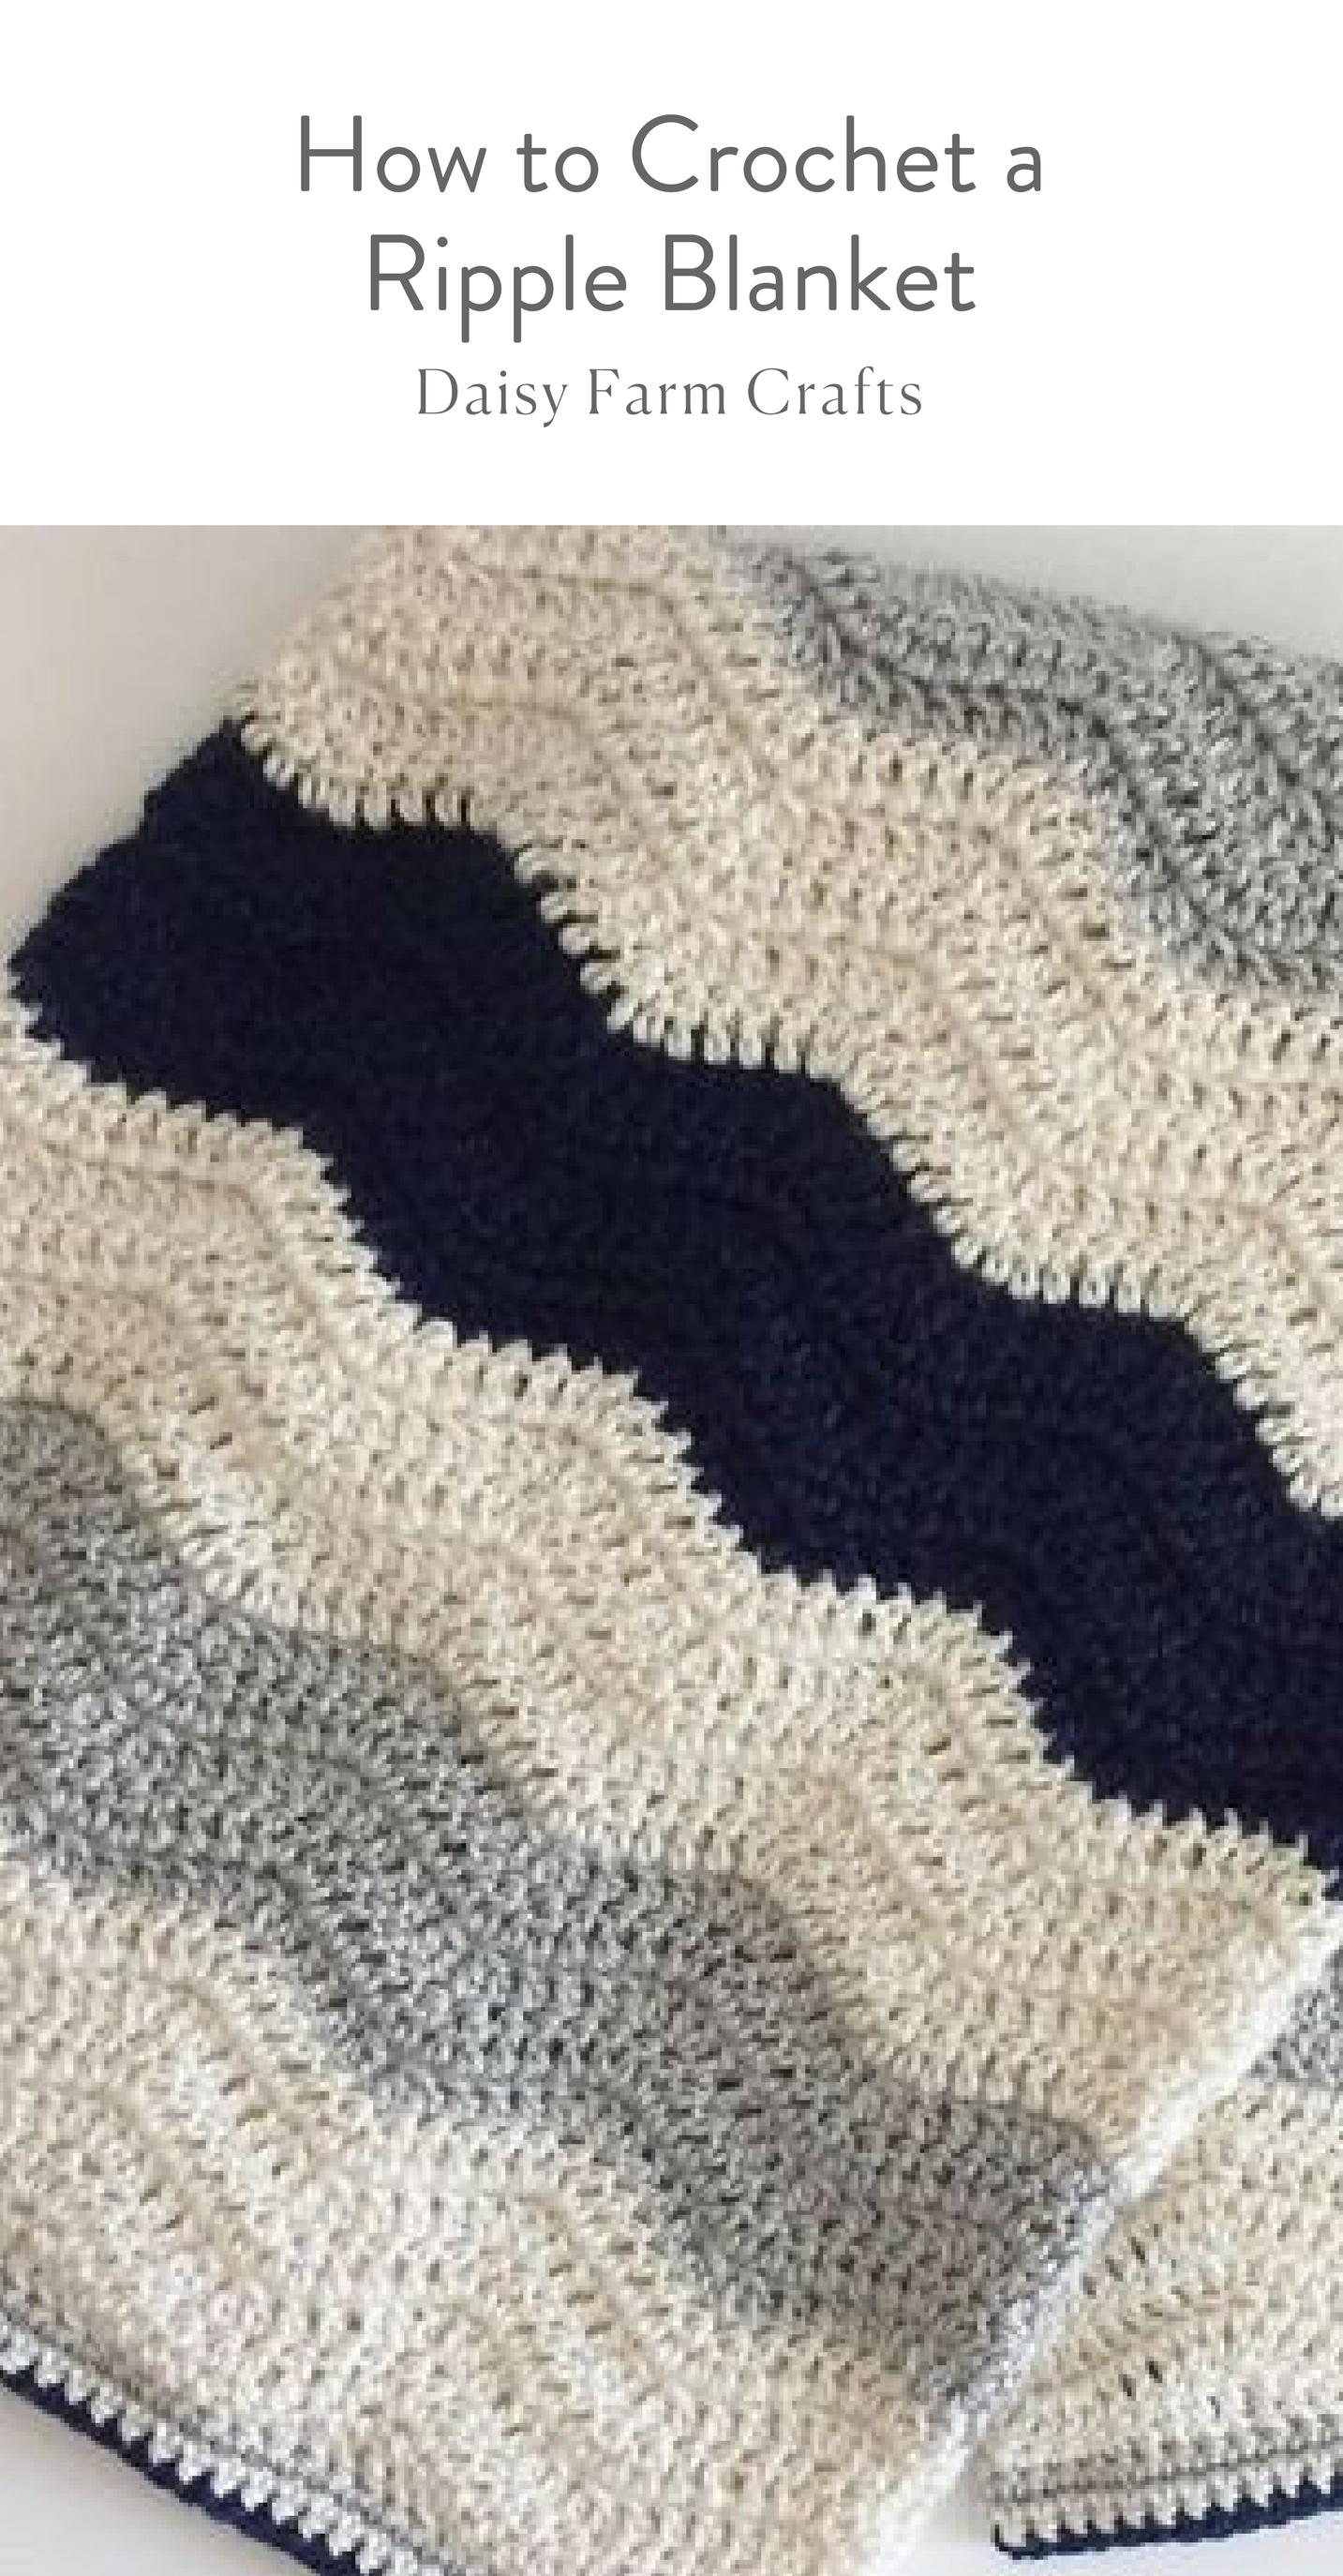 How to Crochet a Ripple Blanket | mantas muevas | Pinterest | Manta ...